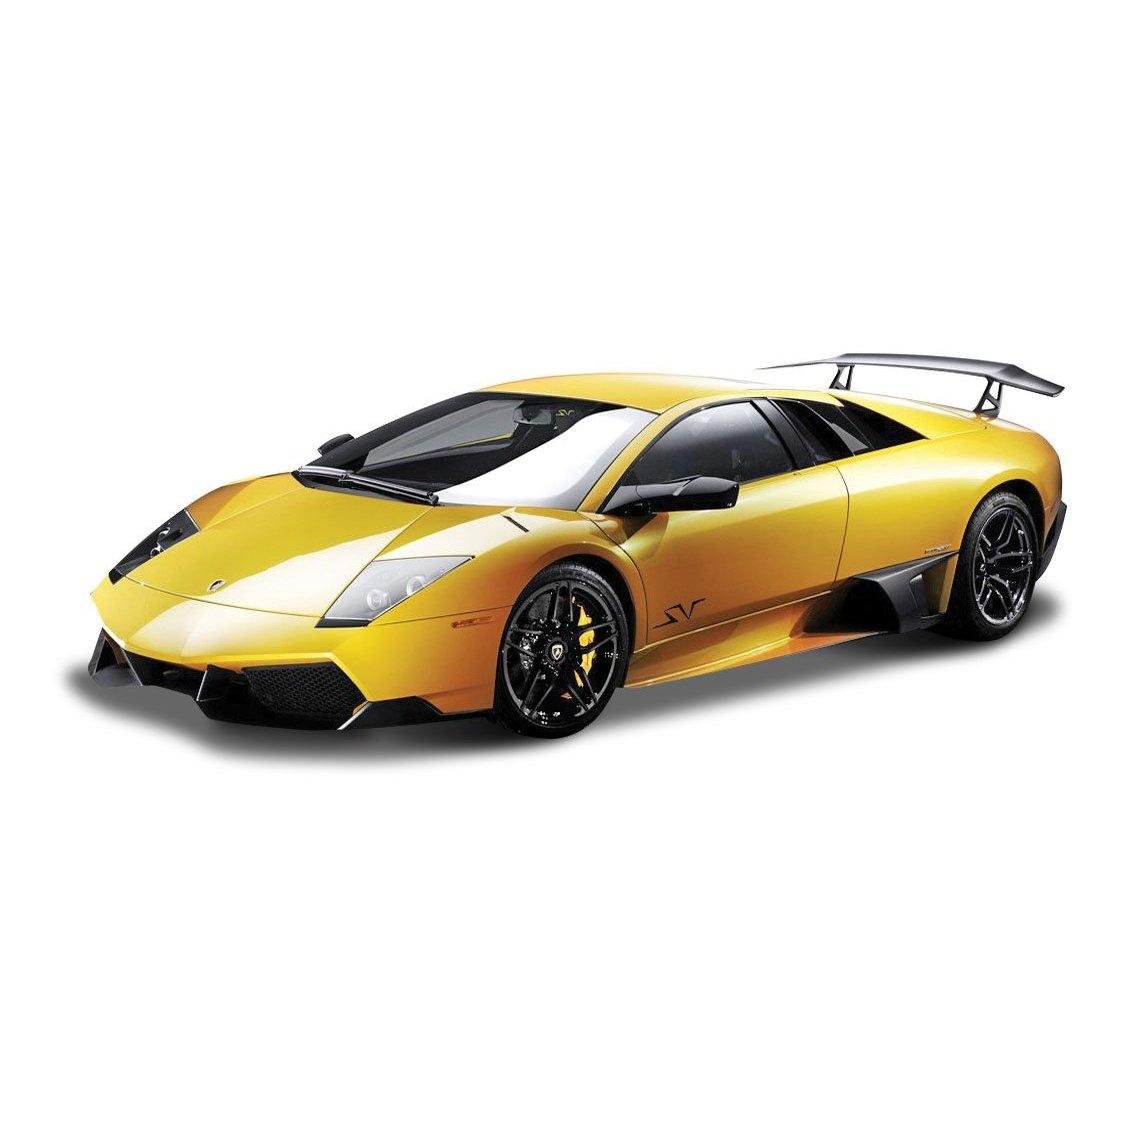 car toy car toy lamborghini rh cartoygariaka blogspot com